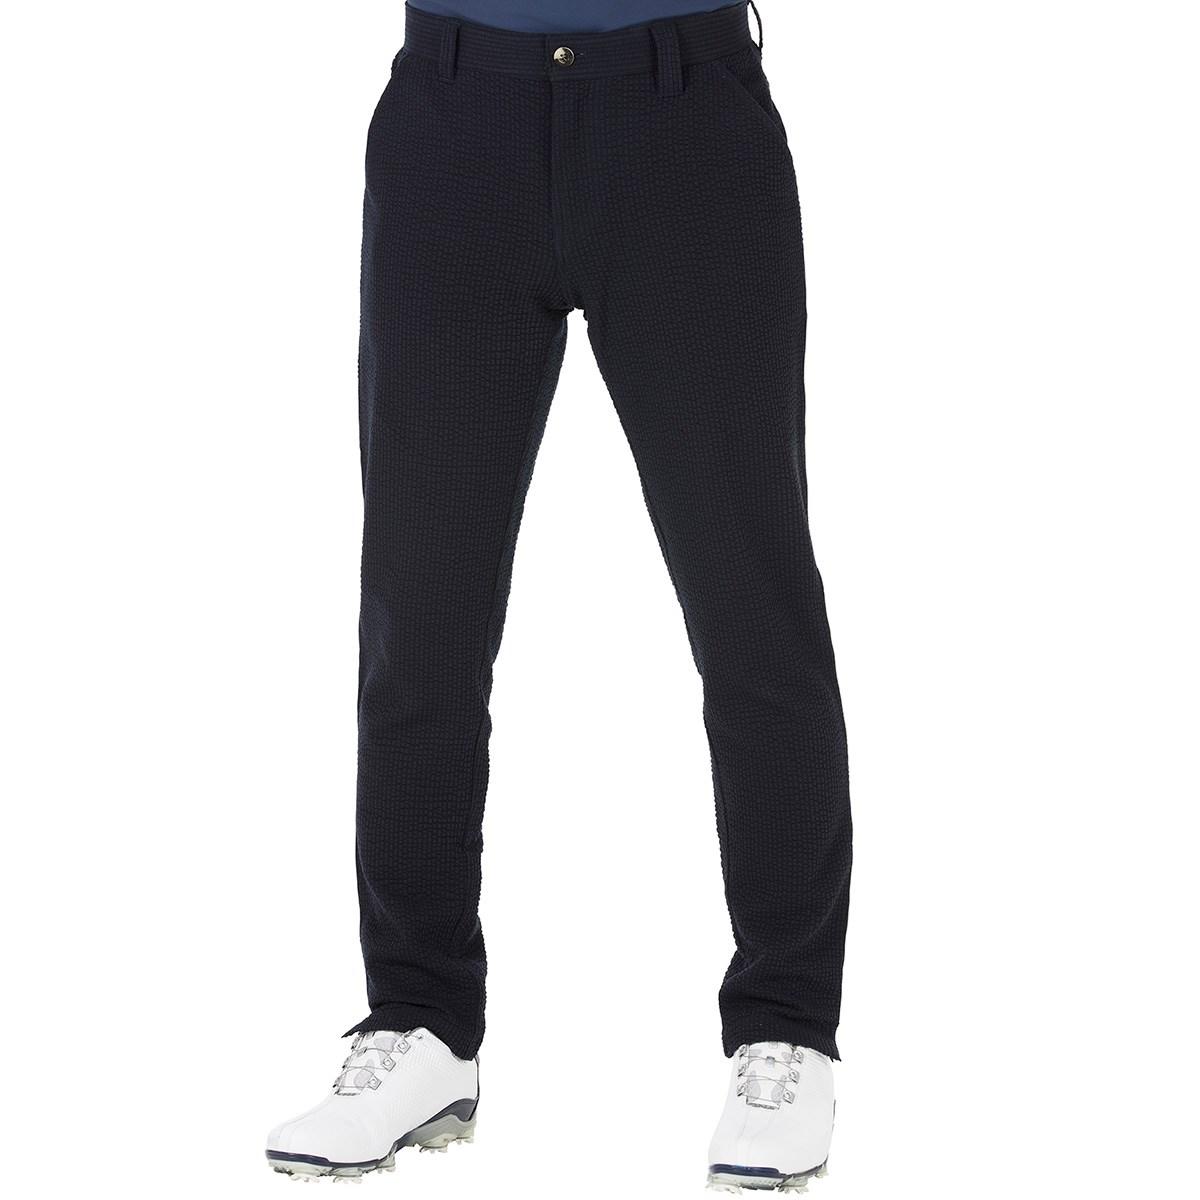 GDO オリジナル GDO ORIGINAL サッカージャージパンツ 股下79cm 1:ウエスト目安75-77 ネイビー